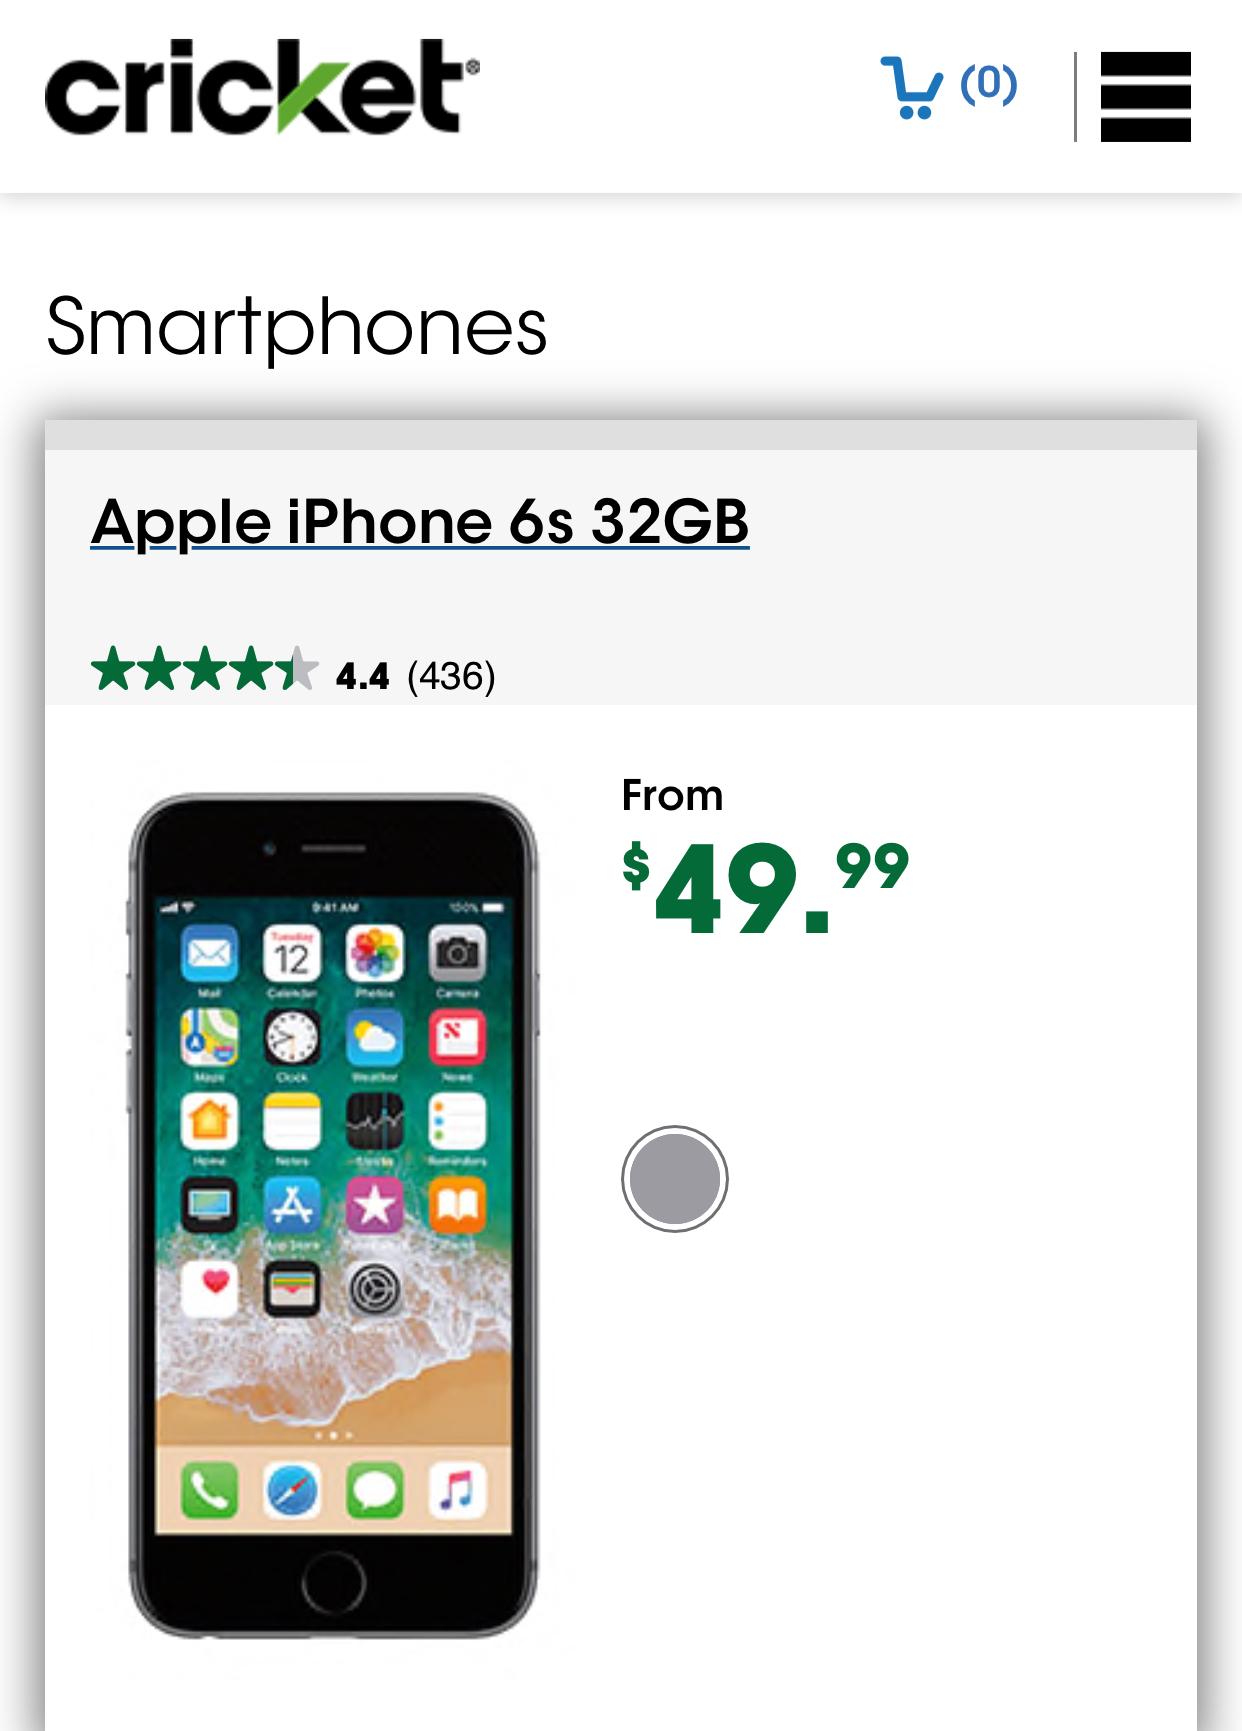 Apple 6s 32 GB $49.99 Cricket Wireless